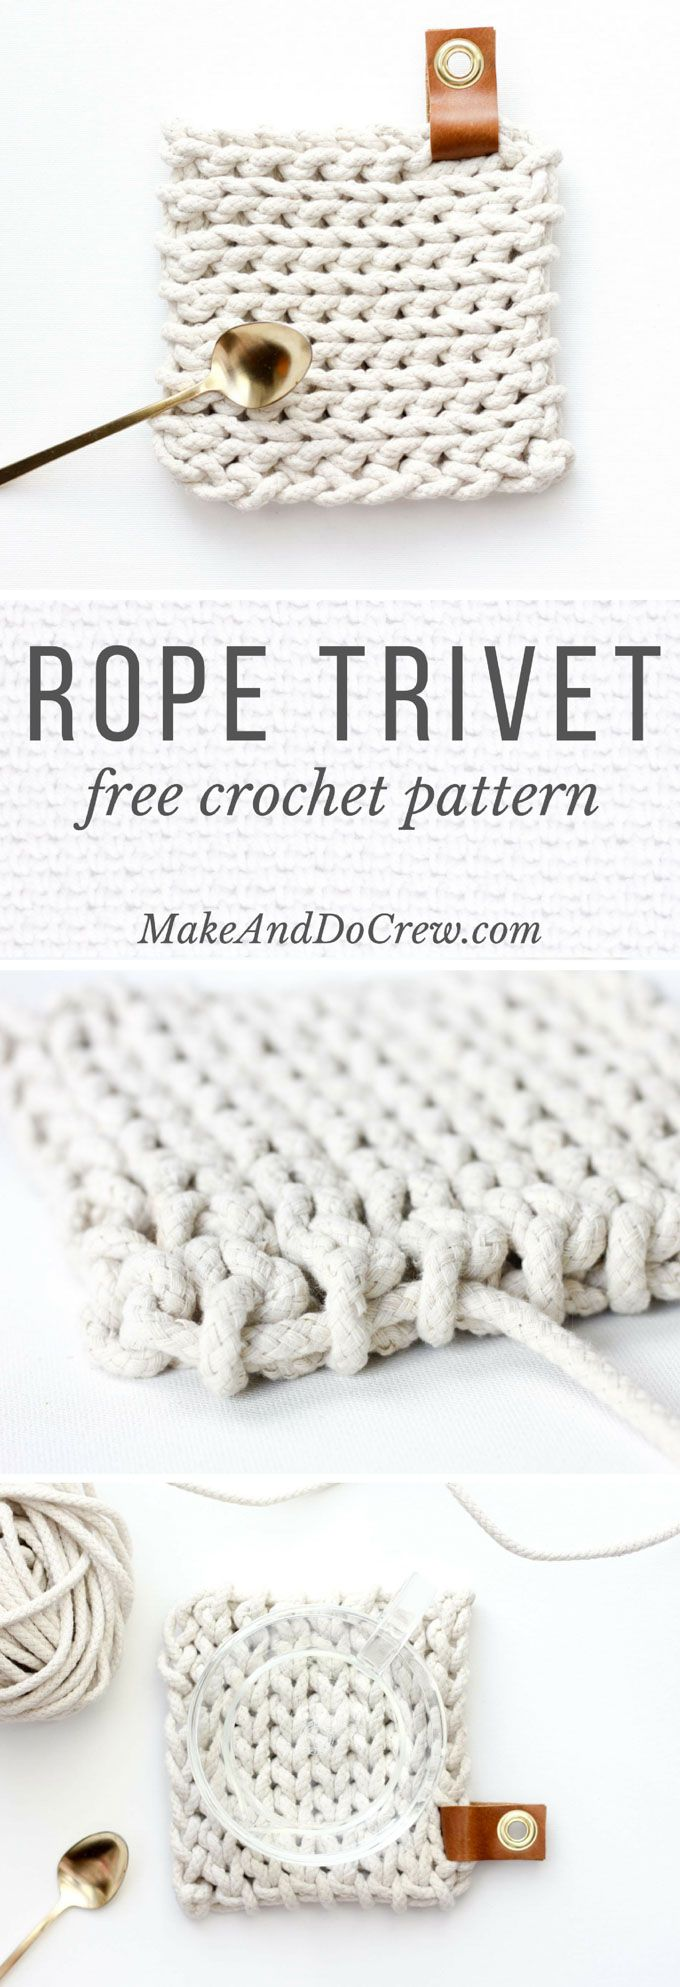 Clothesline Trivet - Free Modern Crochet Pattern Using Rope ...